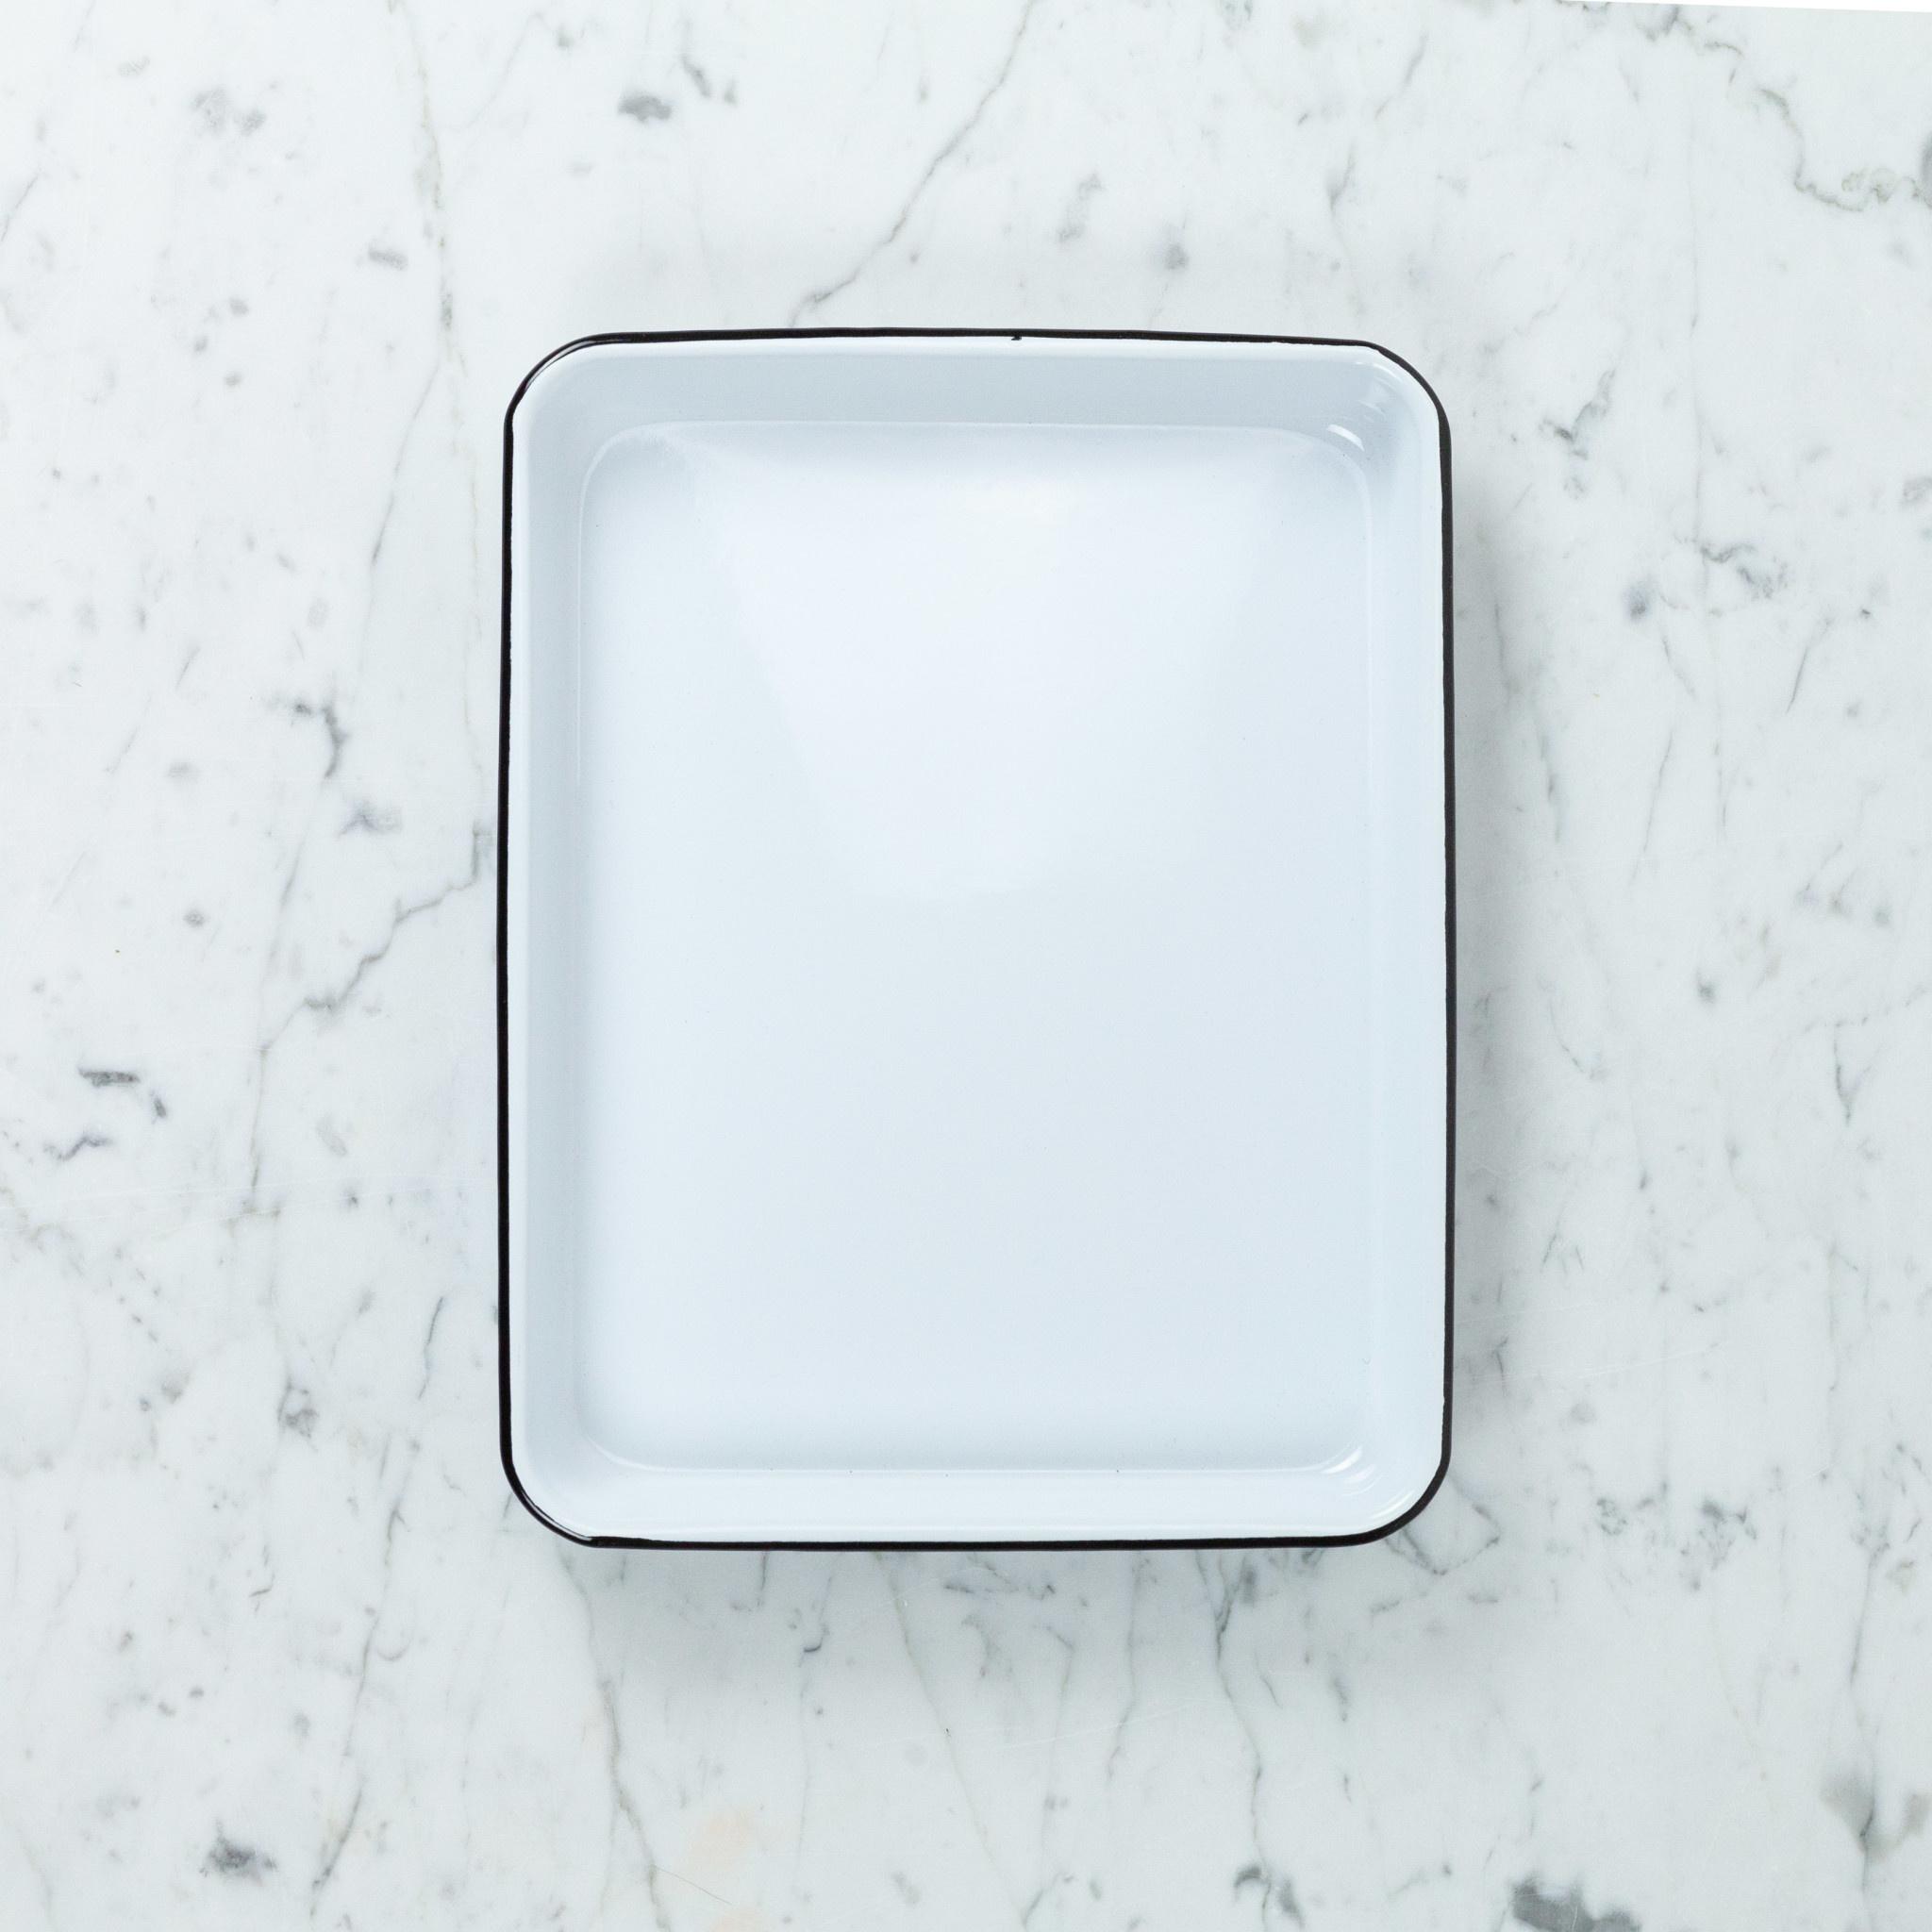 "Black + White Enamel Baking or Serving Tray - 11 x 9"""